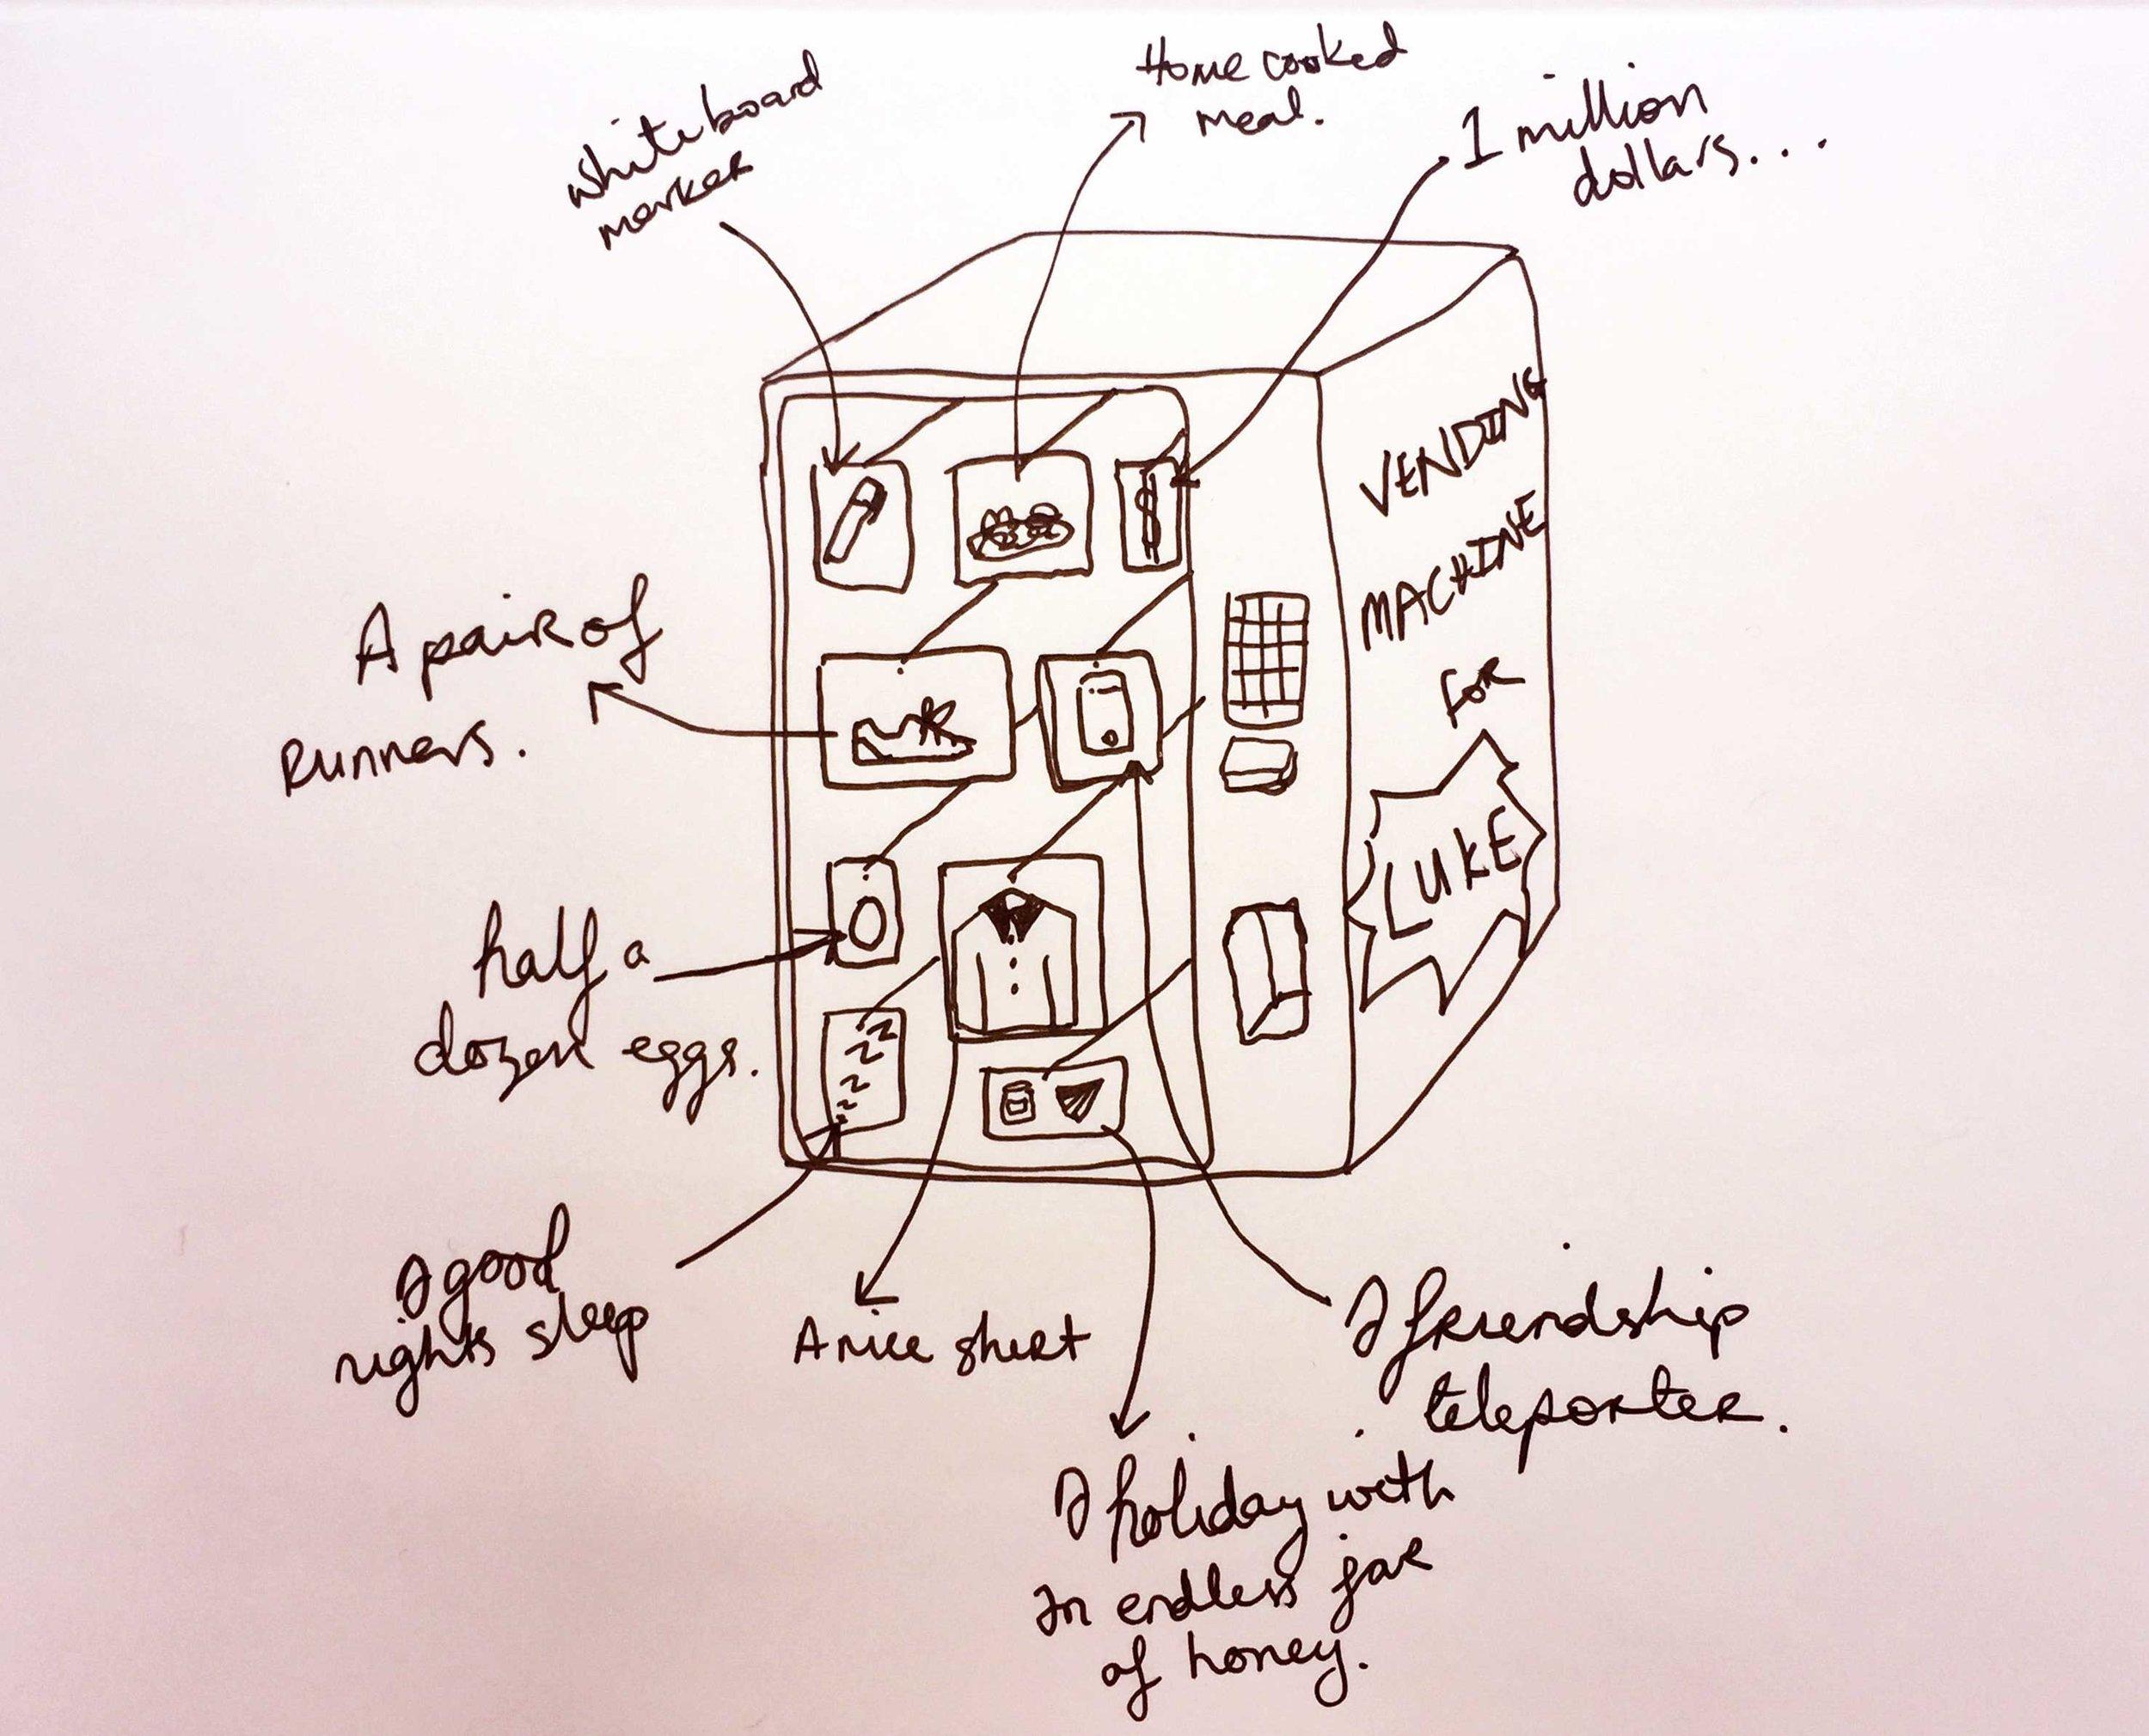 The perfect vending machine. Drawing Luke Hockley